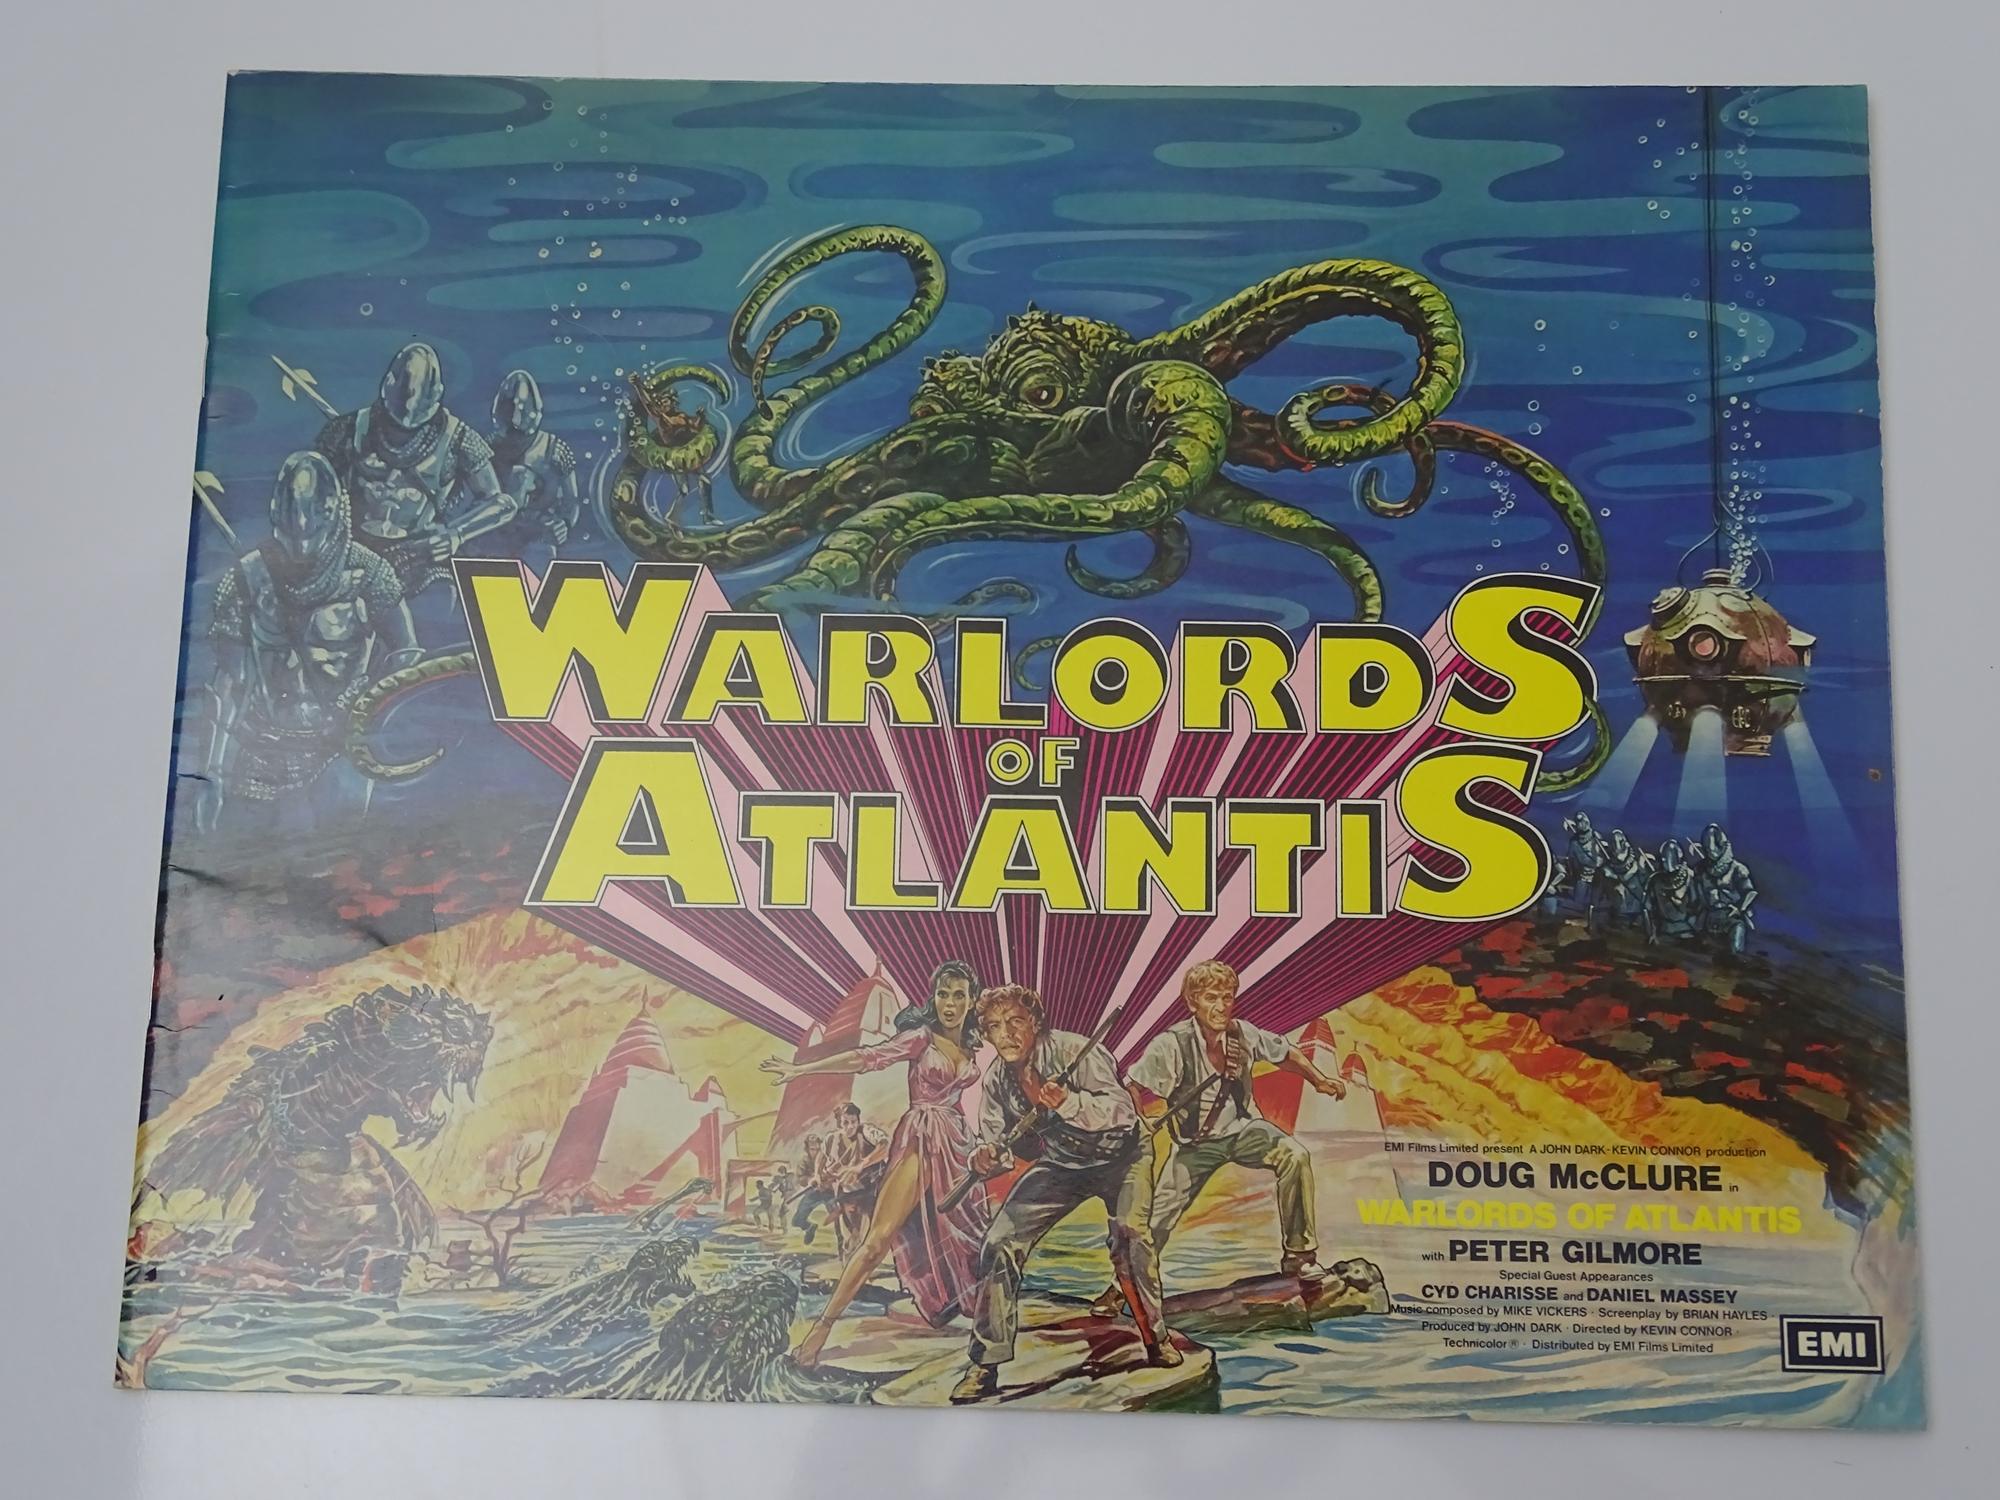 WARLORDS OF ATLANTIS (1978) - PRESSBOOK